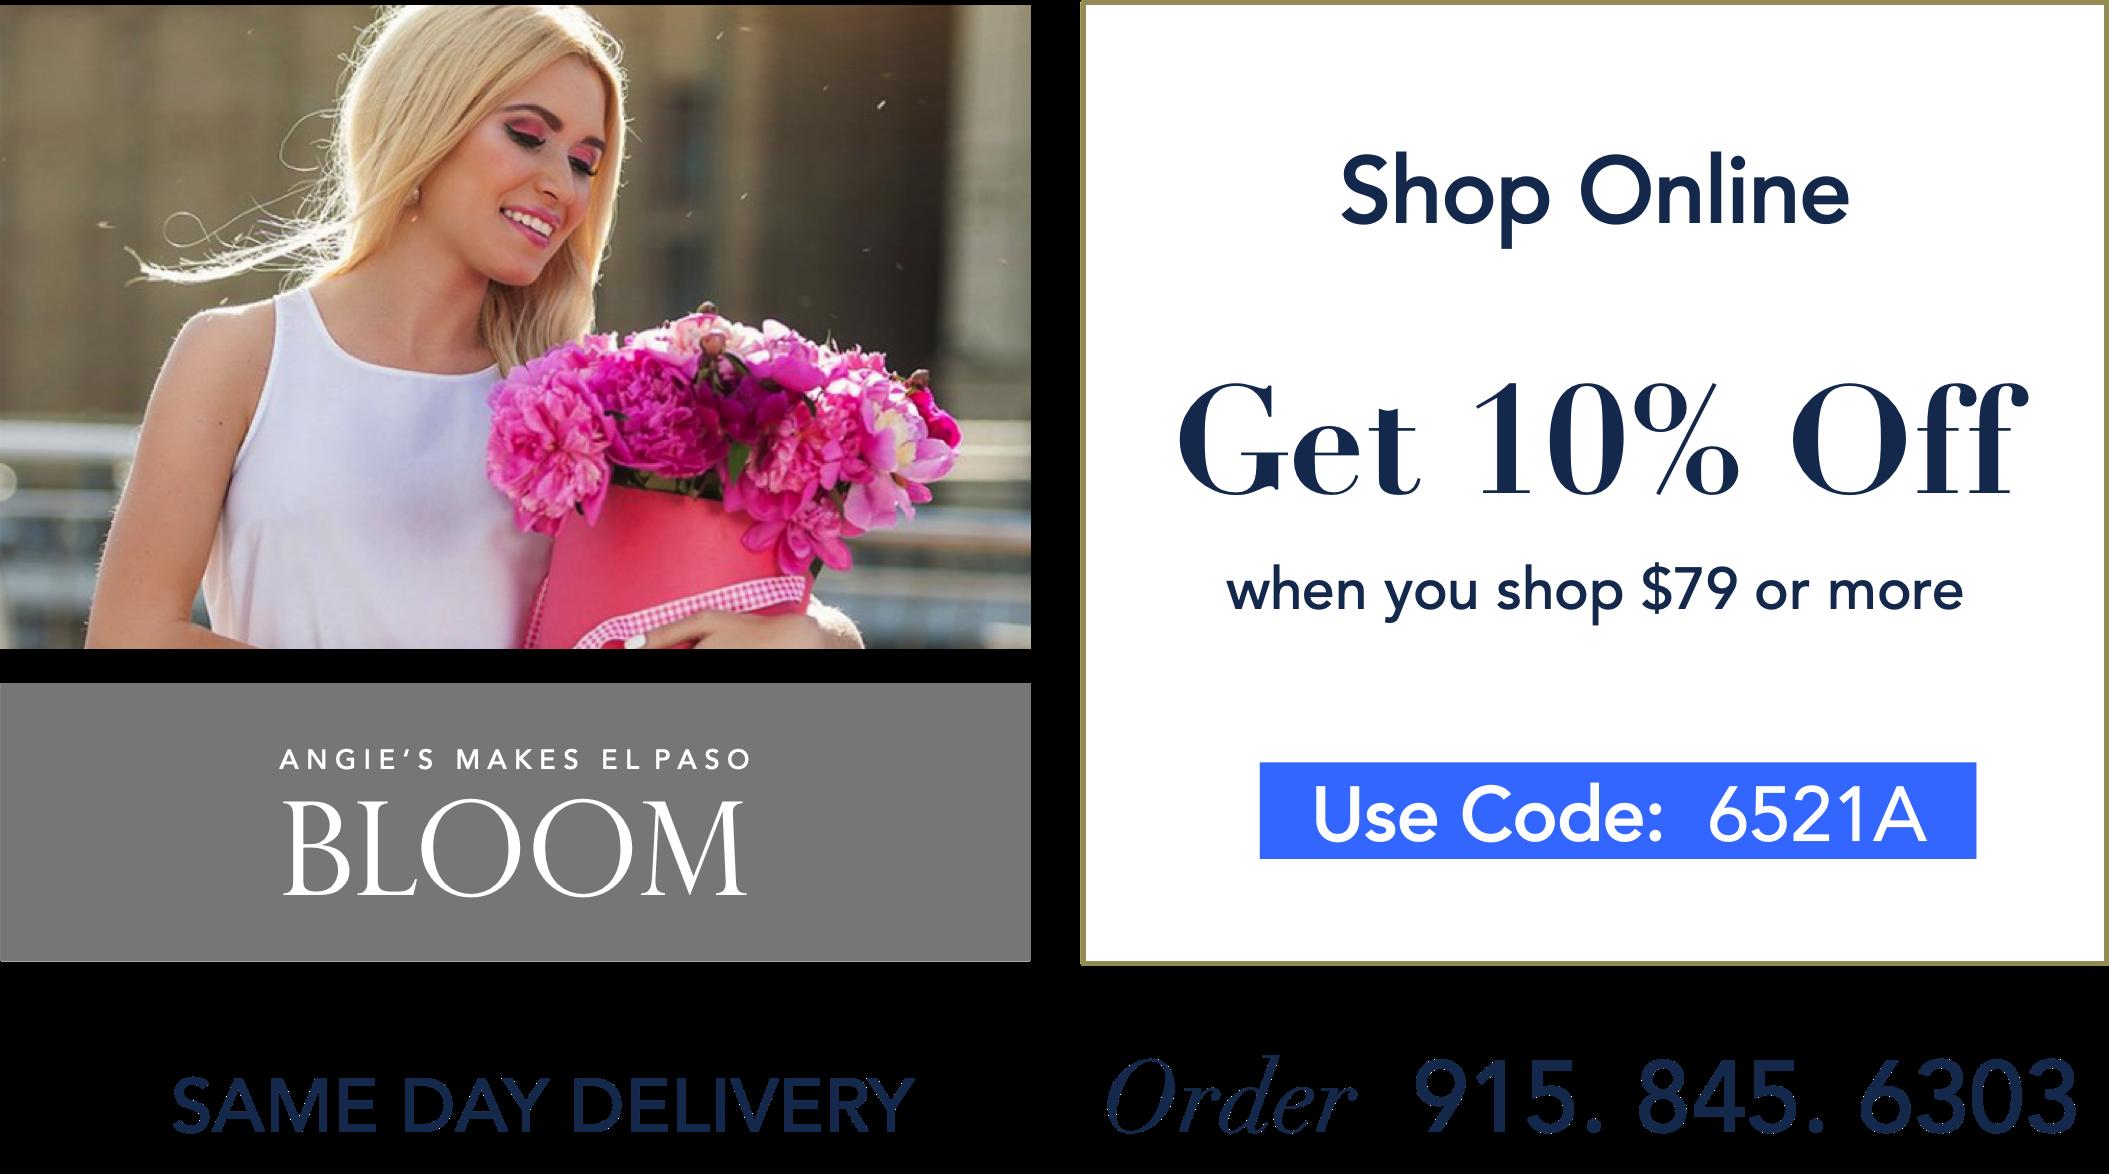 0-angies-floral-designs-texas-el-paso-texas-79912-.png